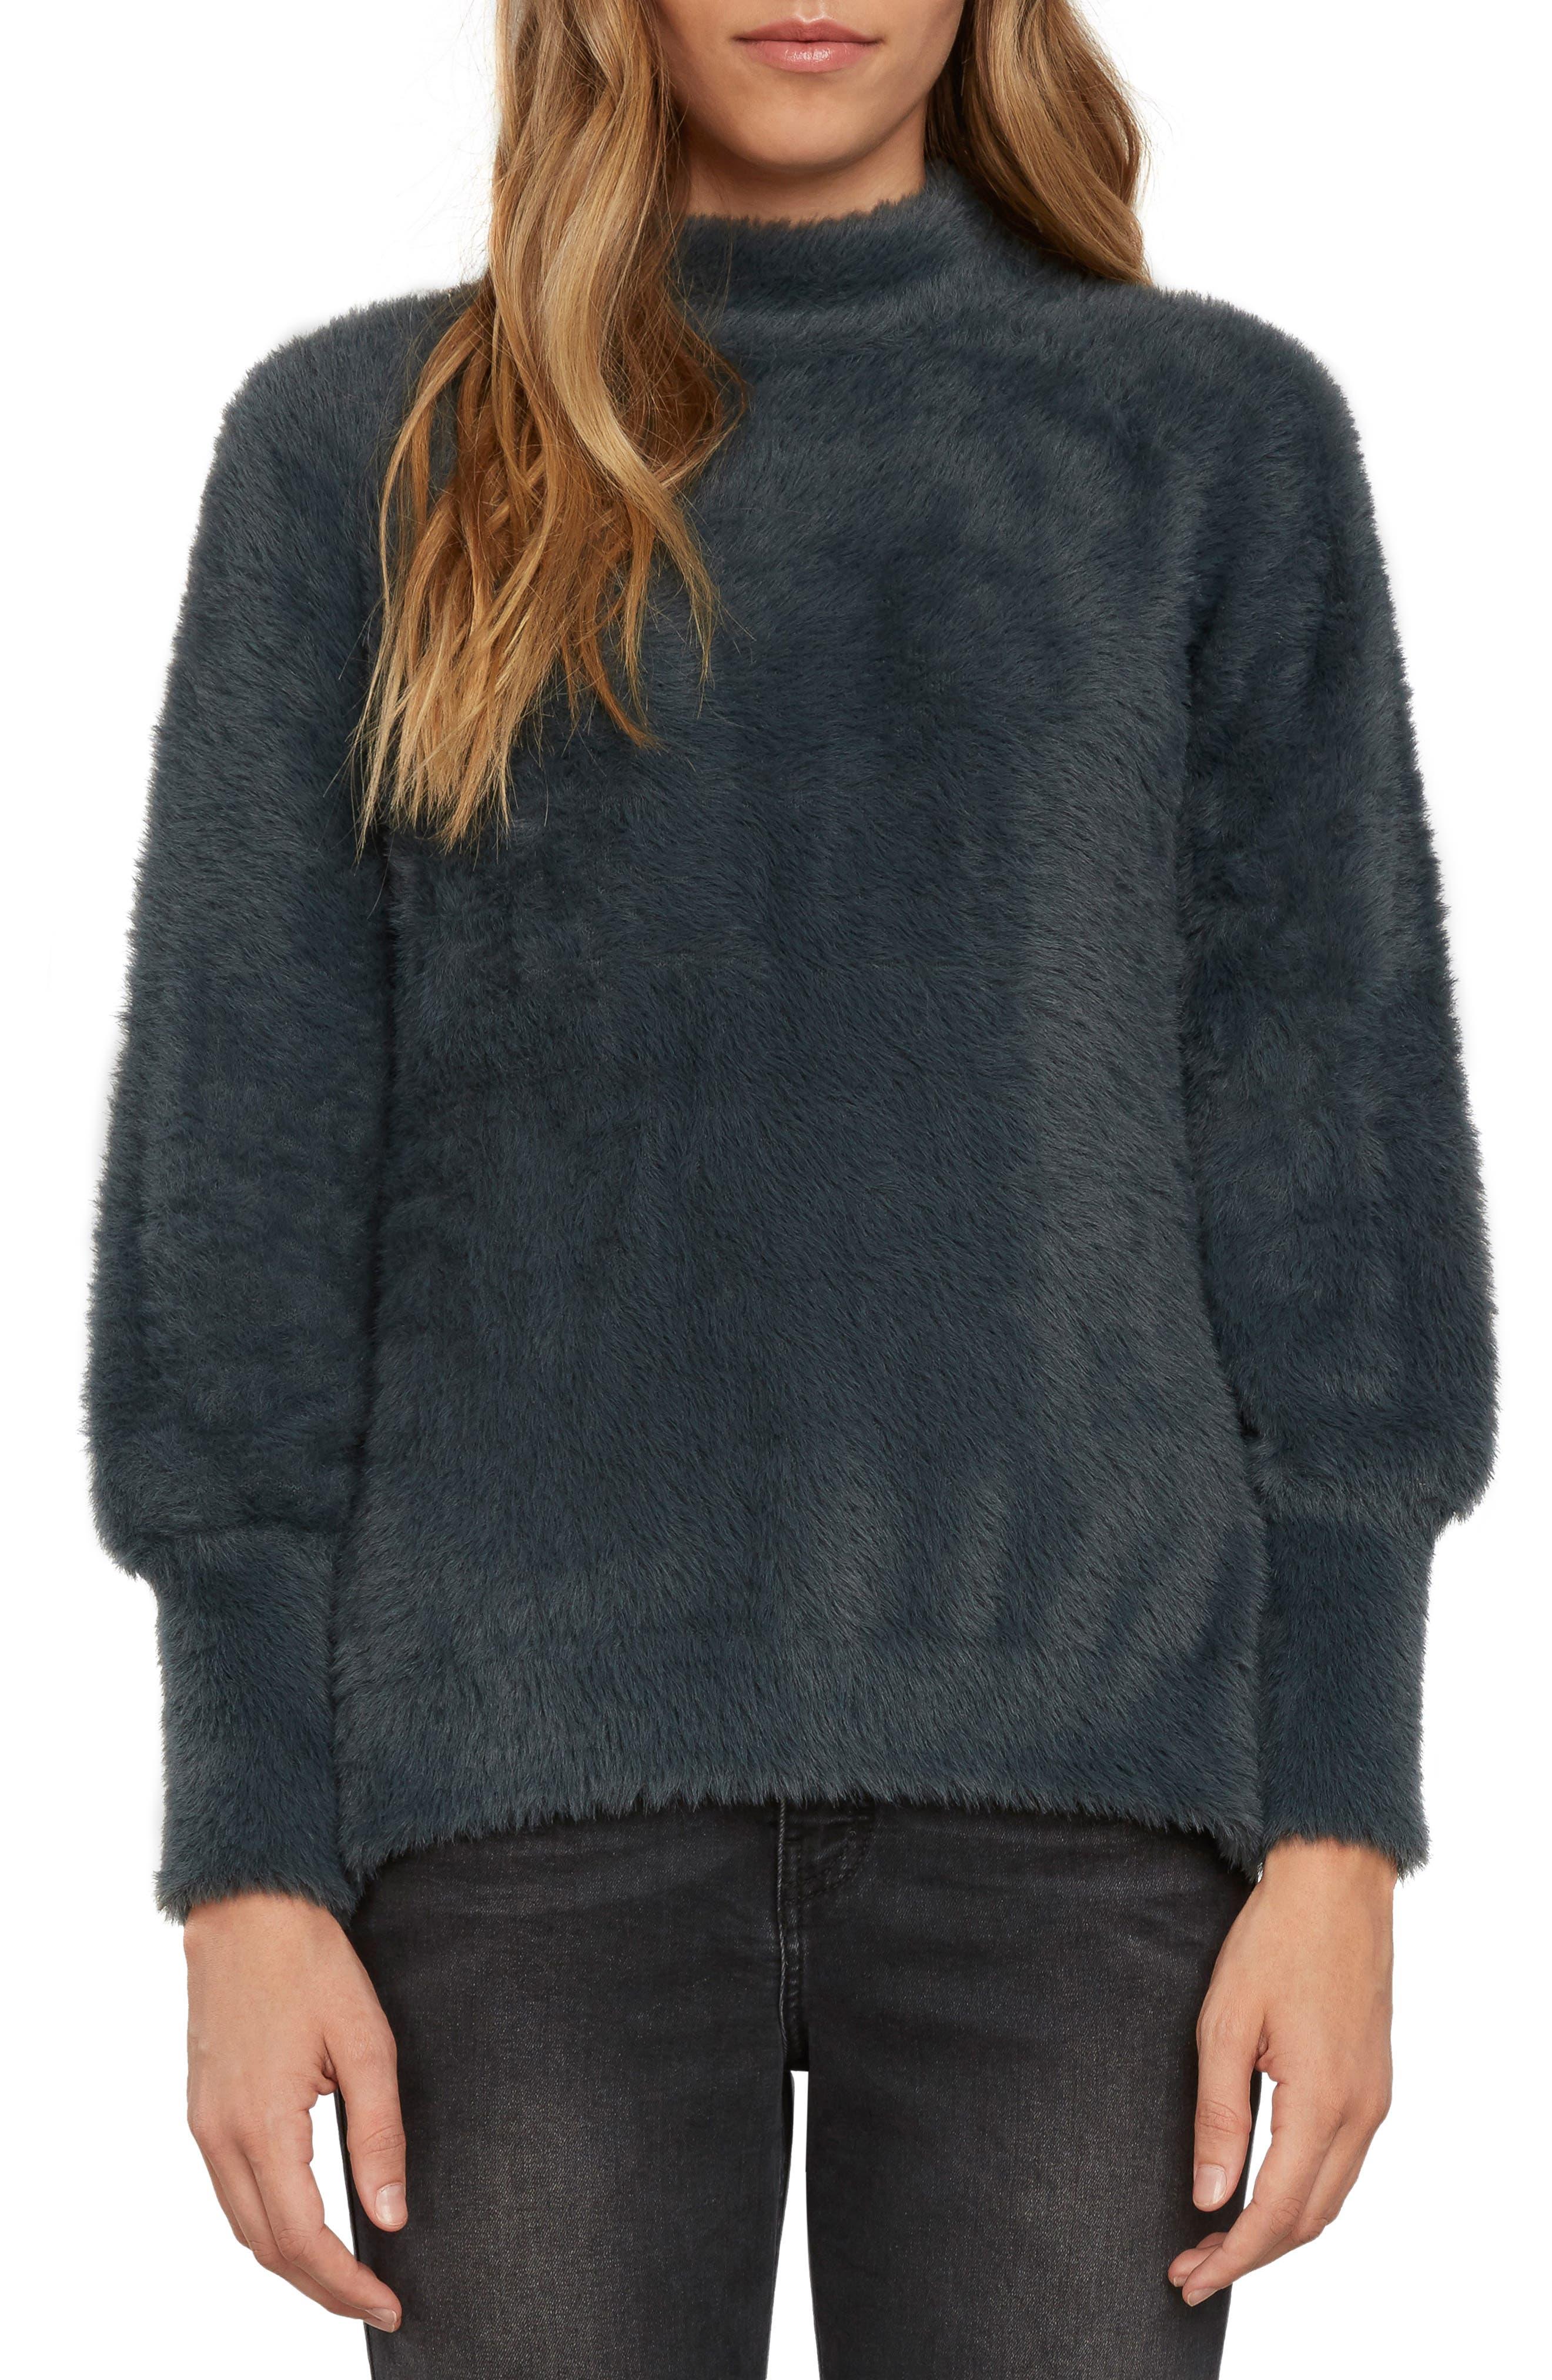 Willow & Clay Fuzzy Mock Neck Sweater